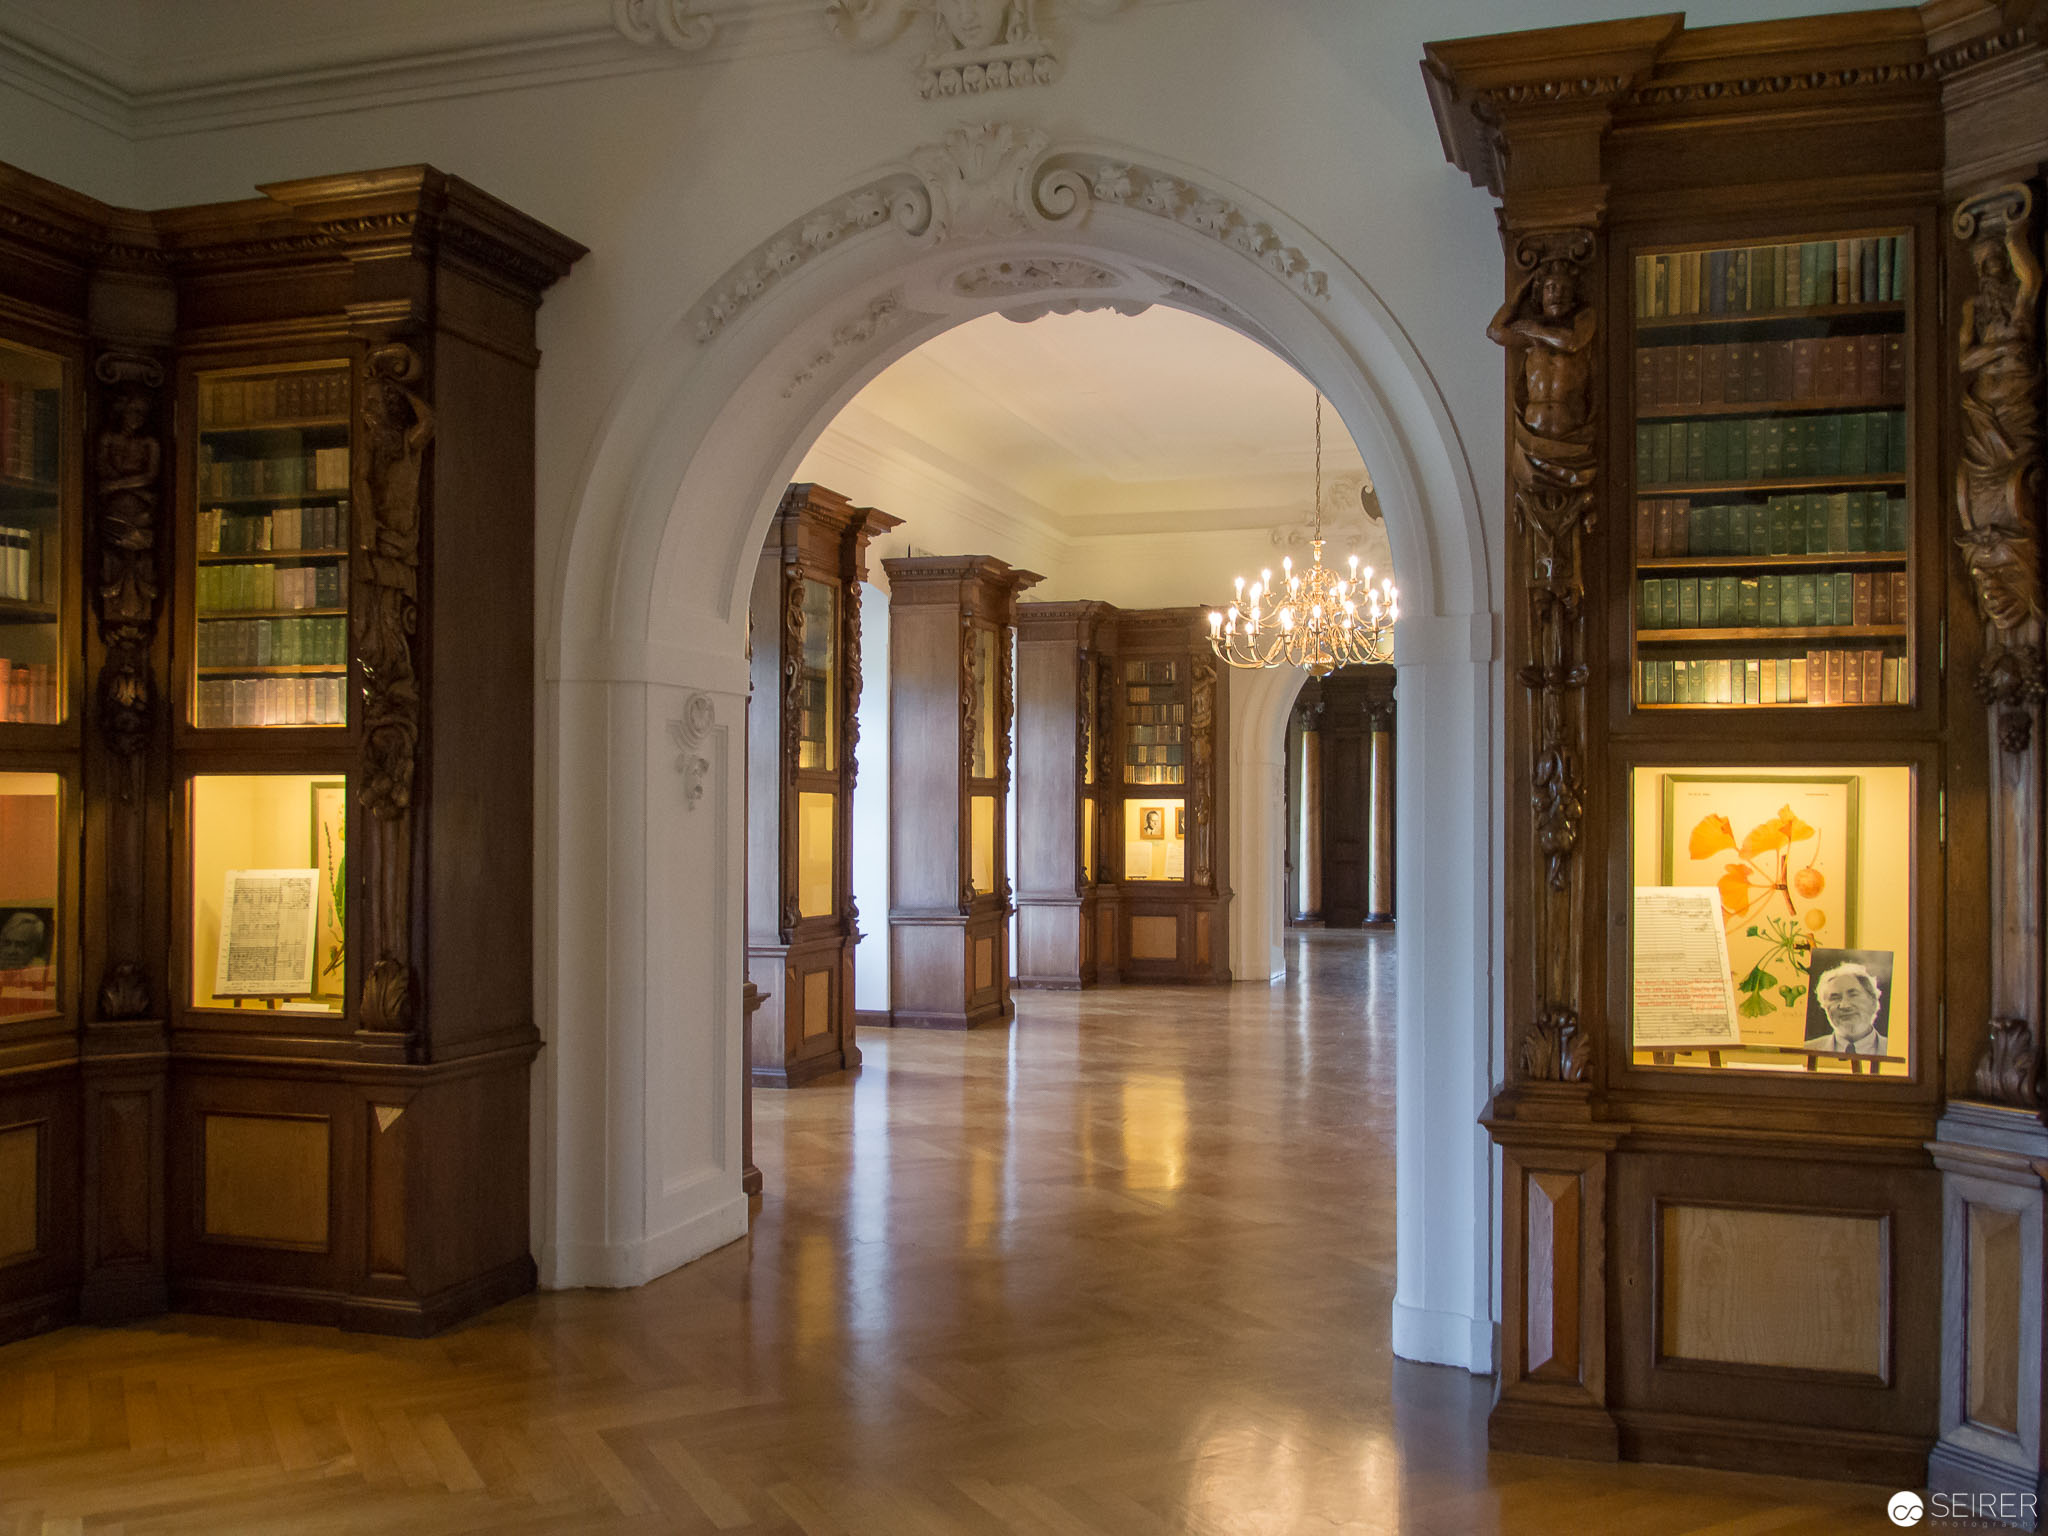 Bibliothek in Schloss Grafenegg